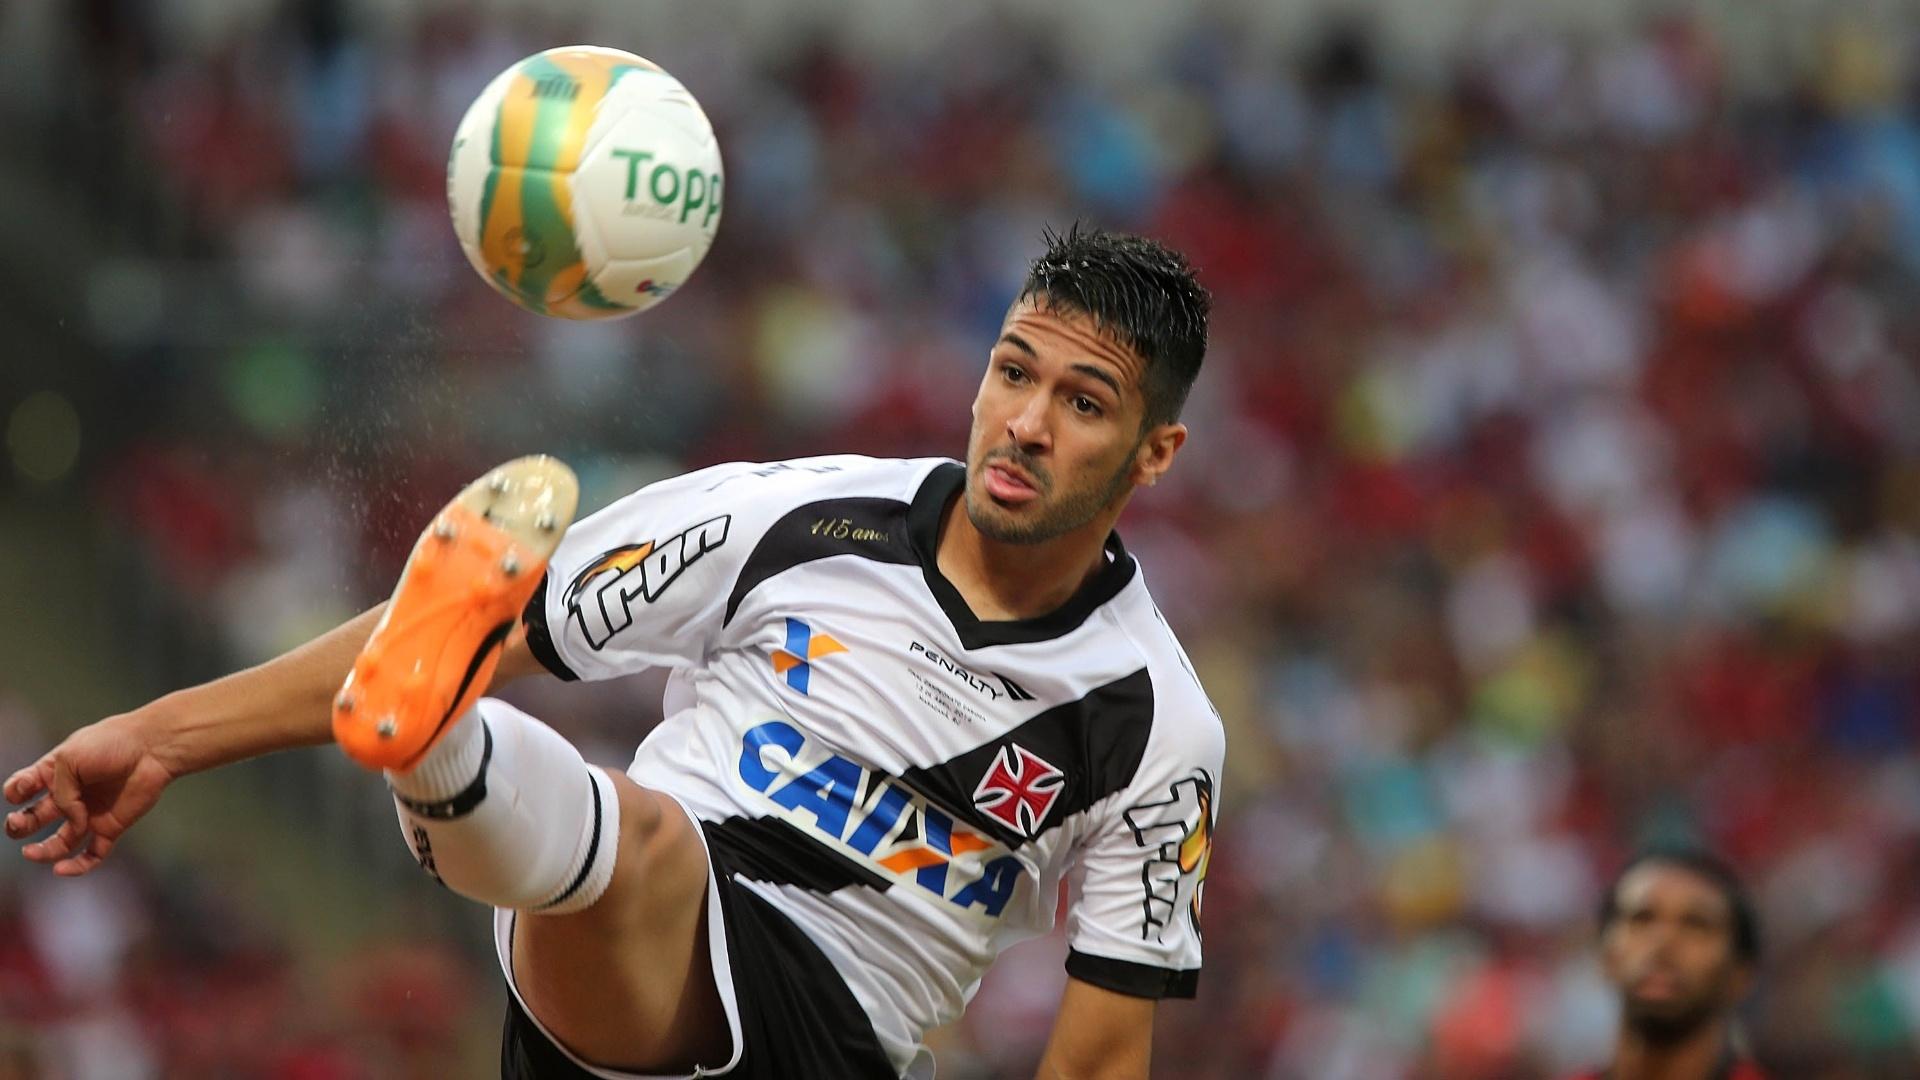 Luan tenta dominar a bola para o Vasco na final do Carioca contra o Flamengo